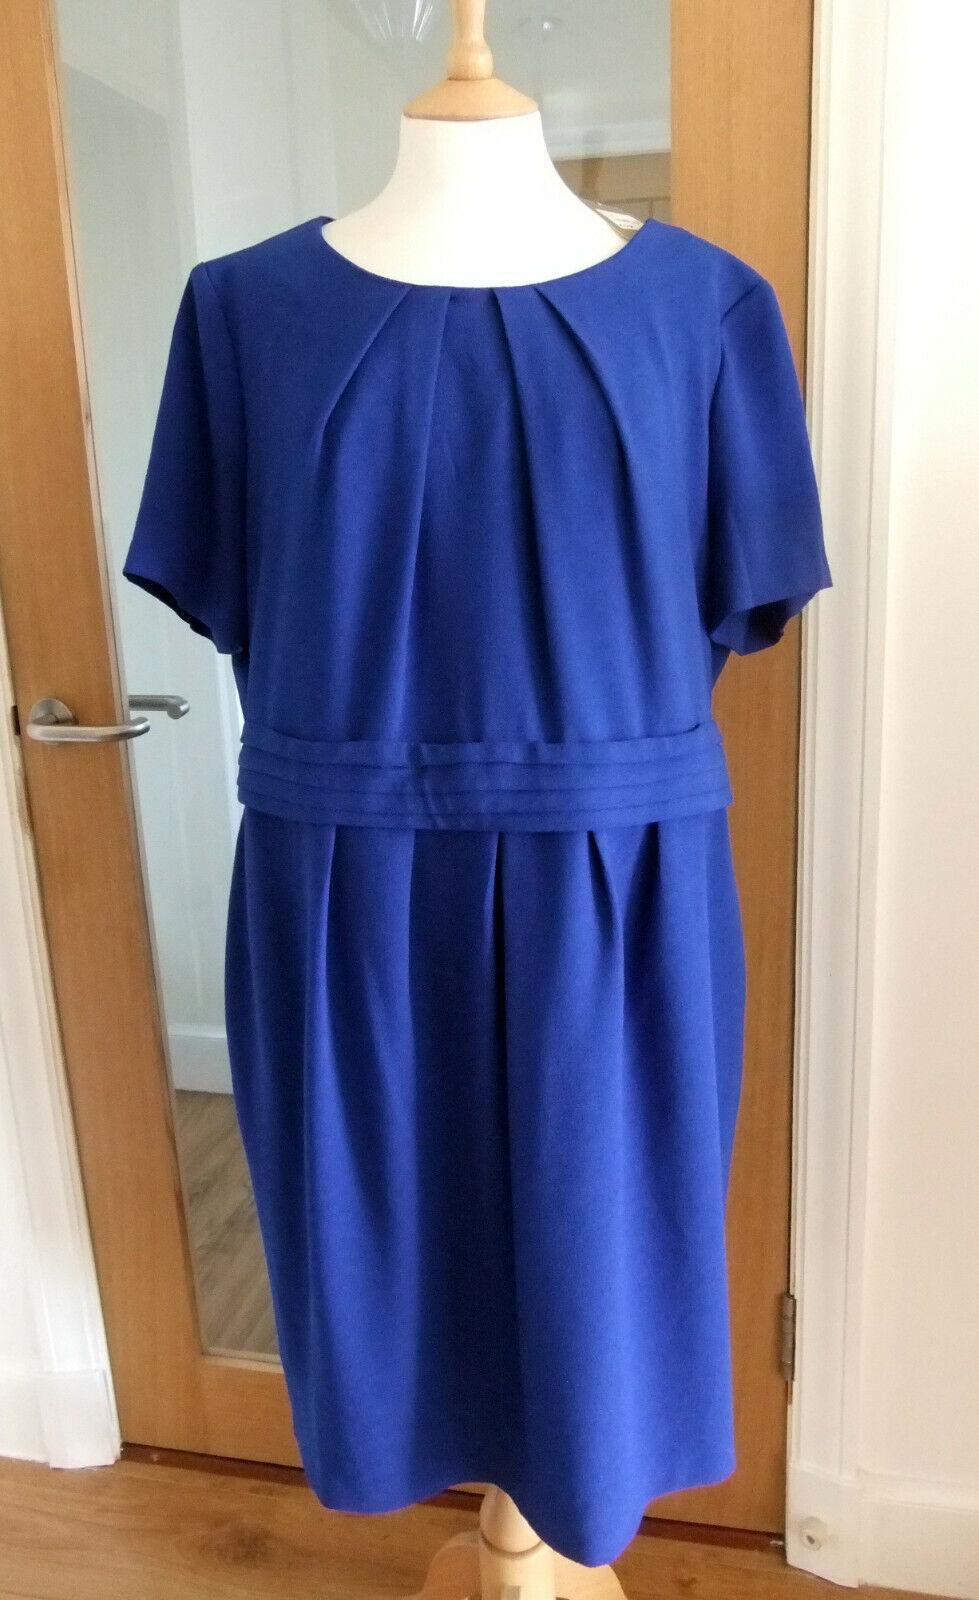 NEW DEBENHAMS CLASSICS blueE TEXTURED SHIFT DRESS SIZE 20